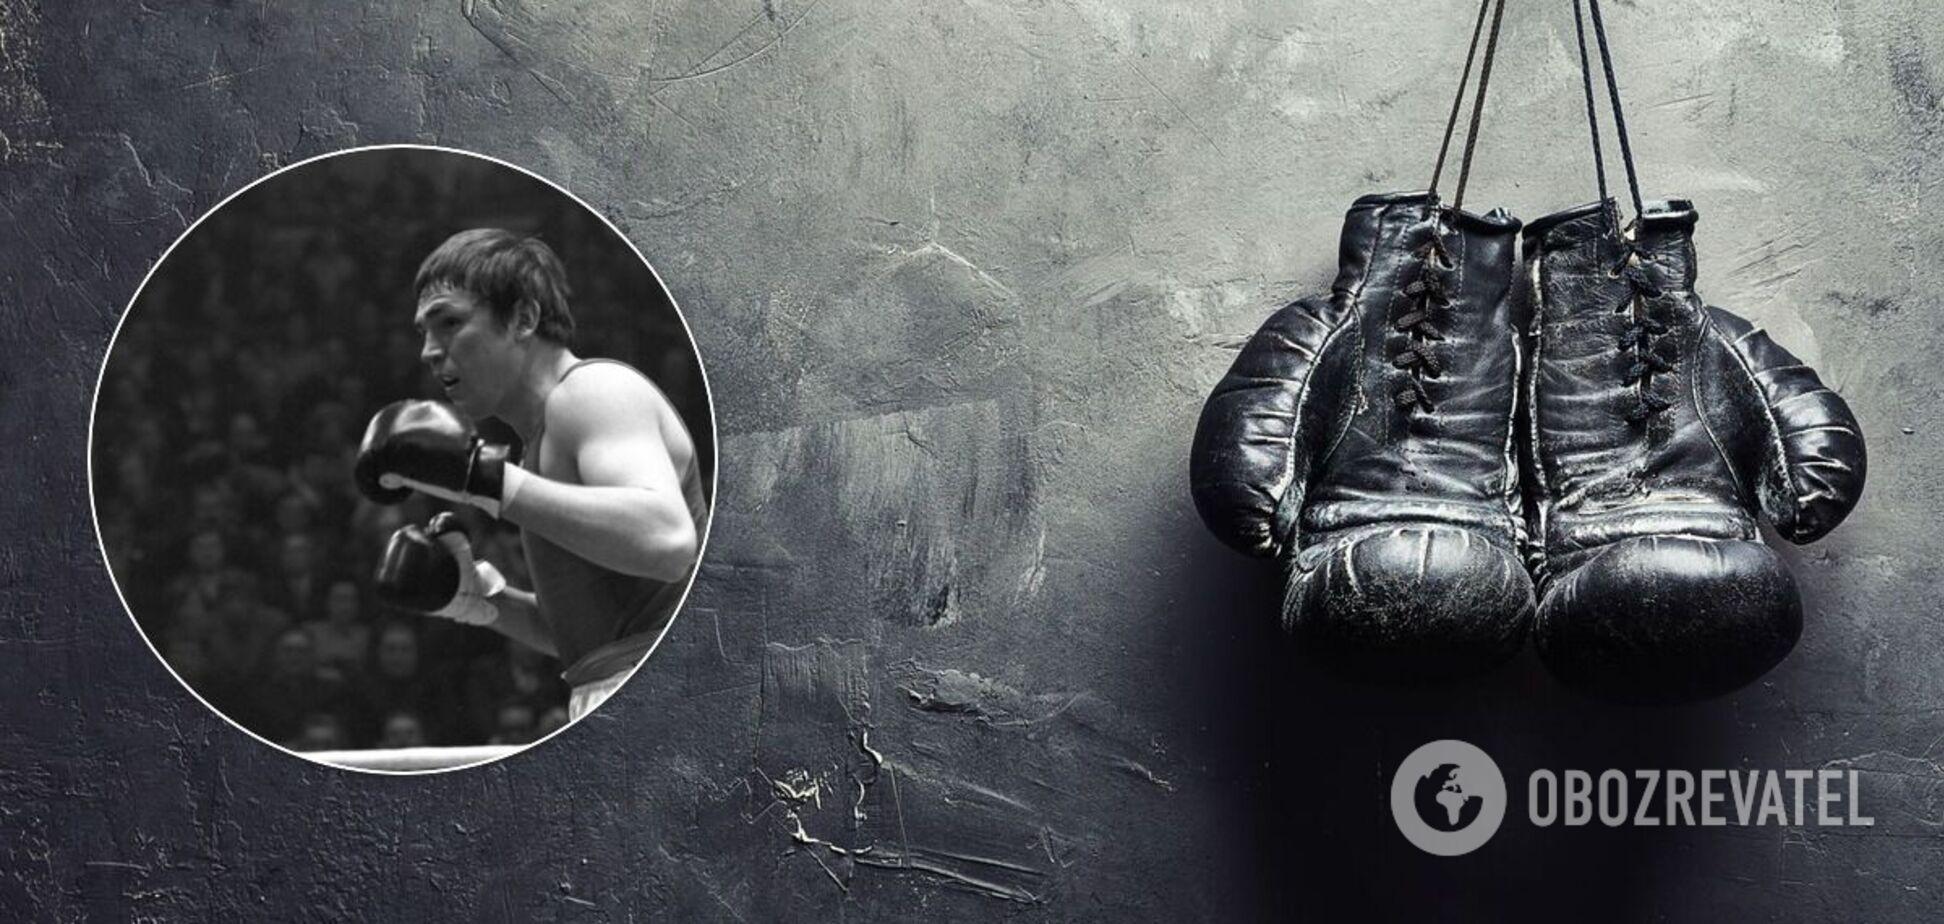 Умер легендарный советский боксер